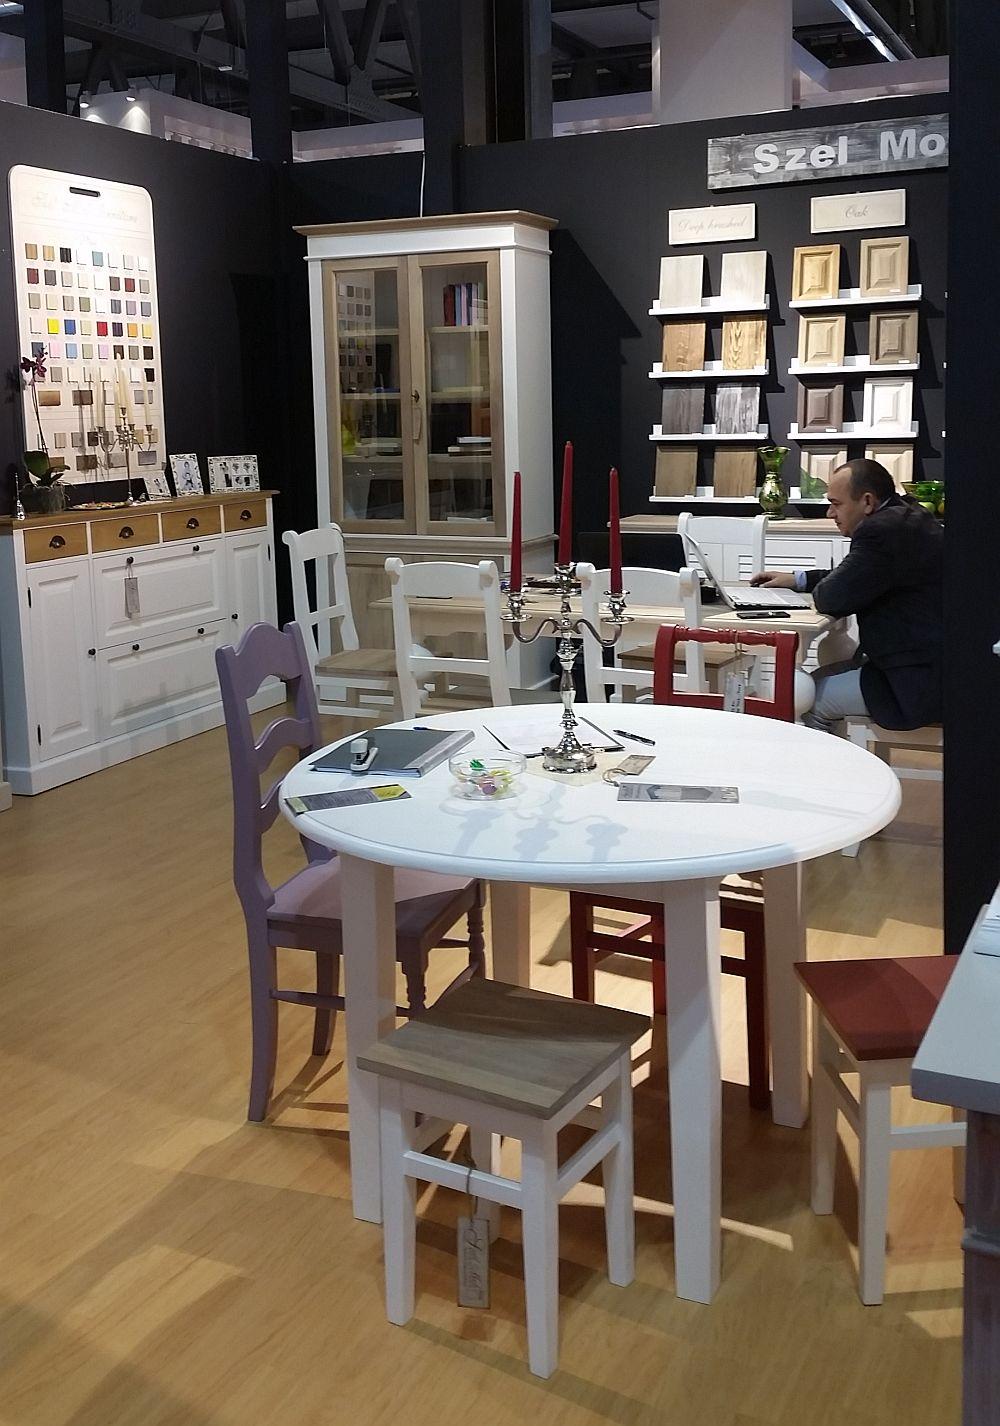 adelaparvu.com despre firme romanesti de mobila la Salone del Mobile Milano 2016, stand Szel Mob (2)